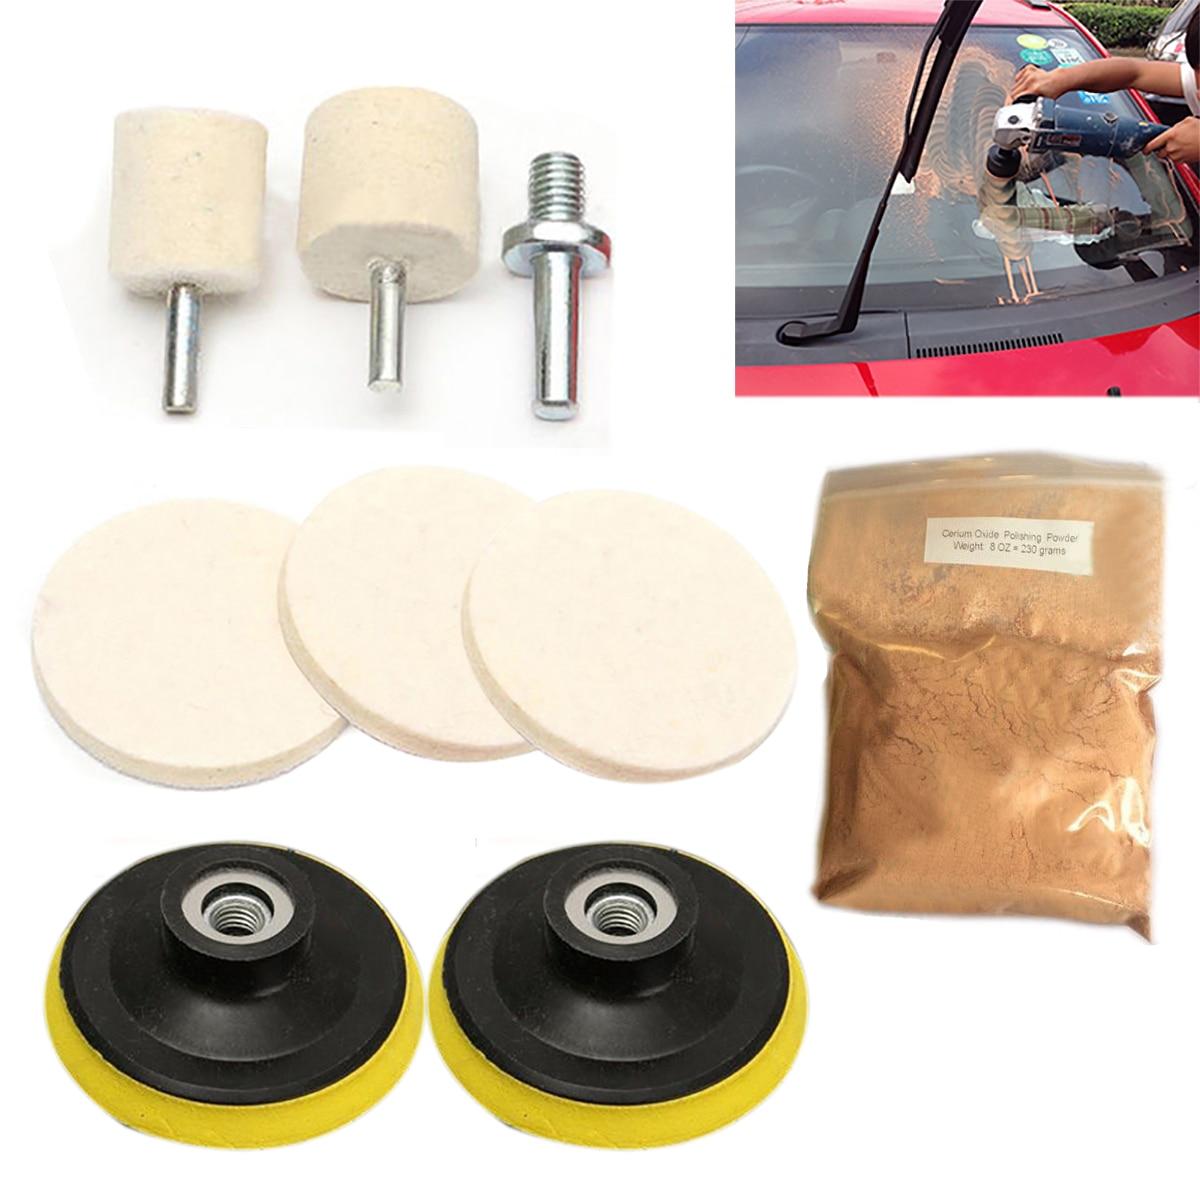 9Pcs/Set Car Window Polishing Kit Windscreen Glass Scratch Remover 8 Oz Cerium Oxide + M10 Thread Drill Adapter + 3 inch Bobs цена 2017